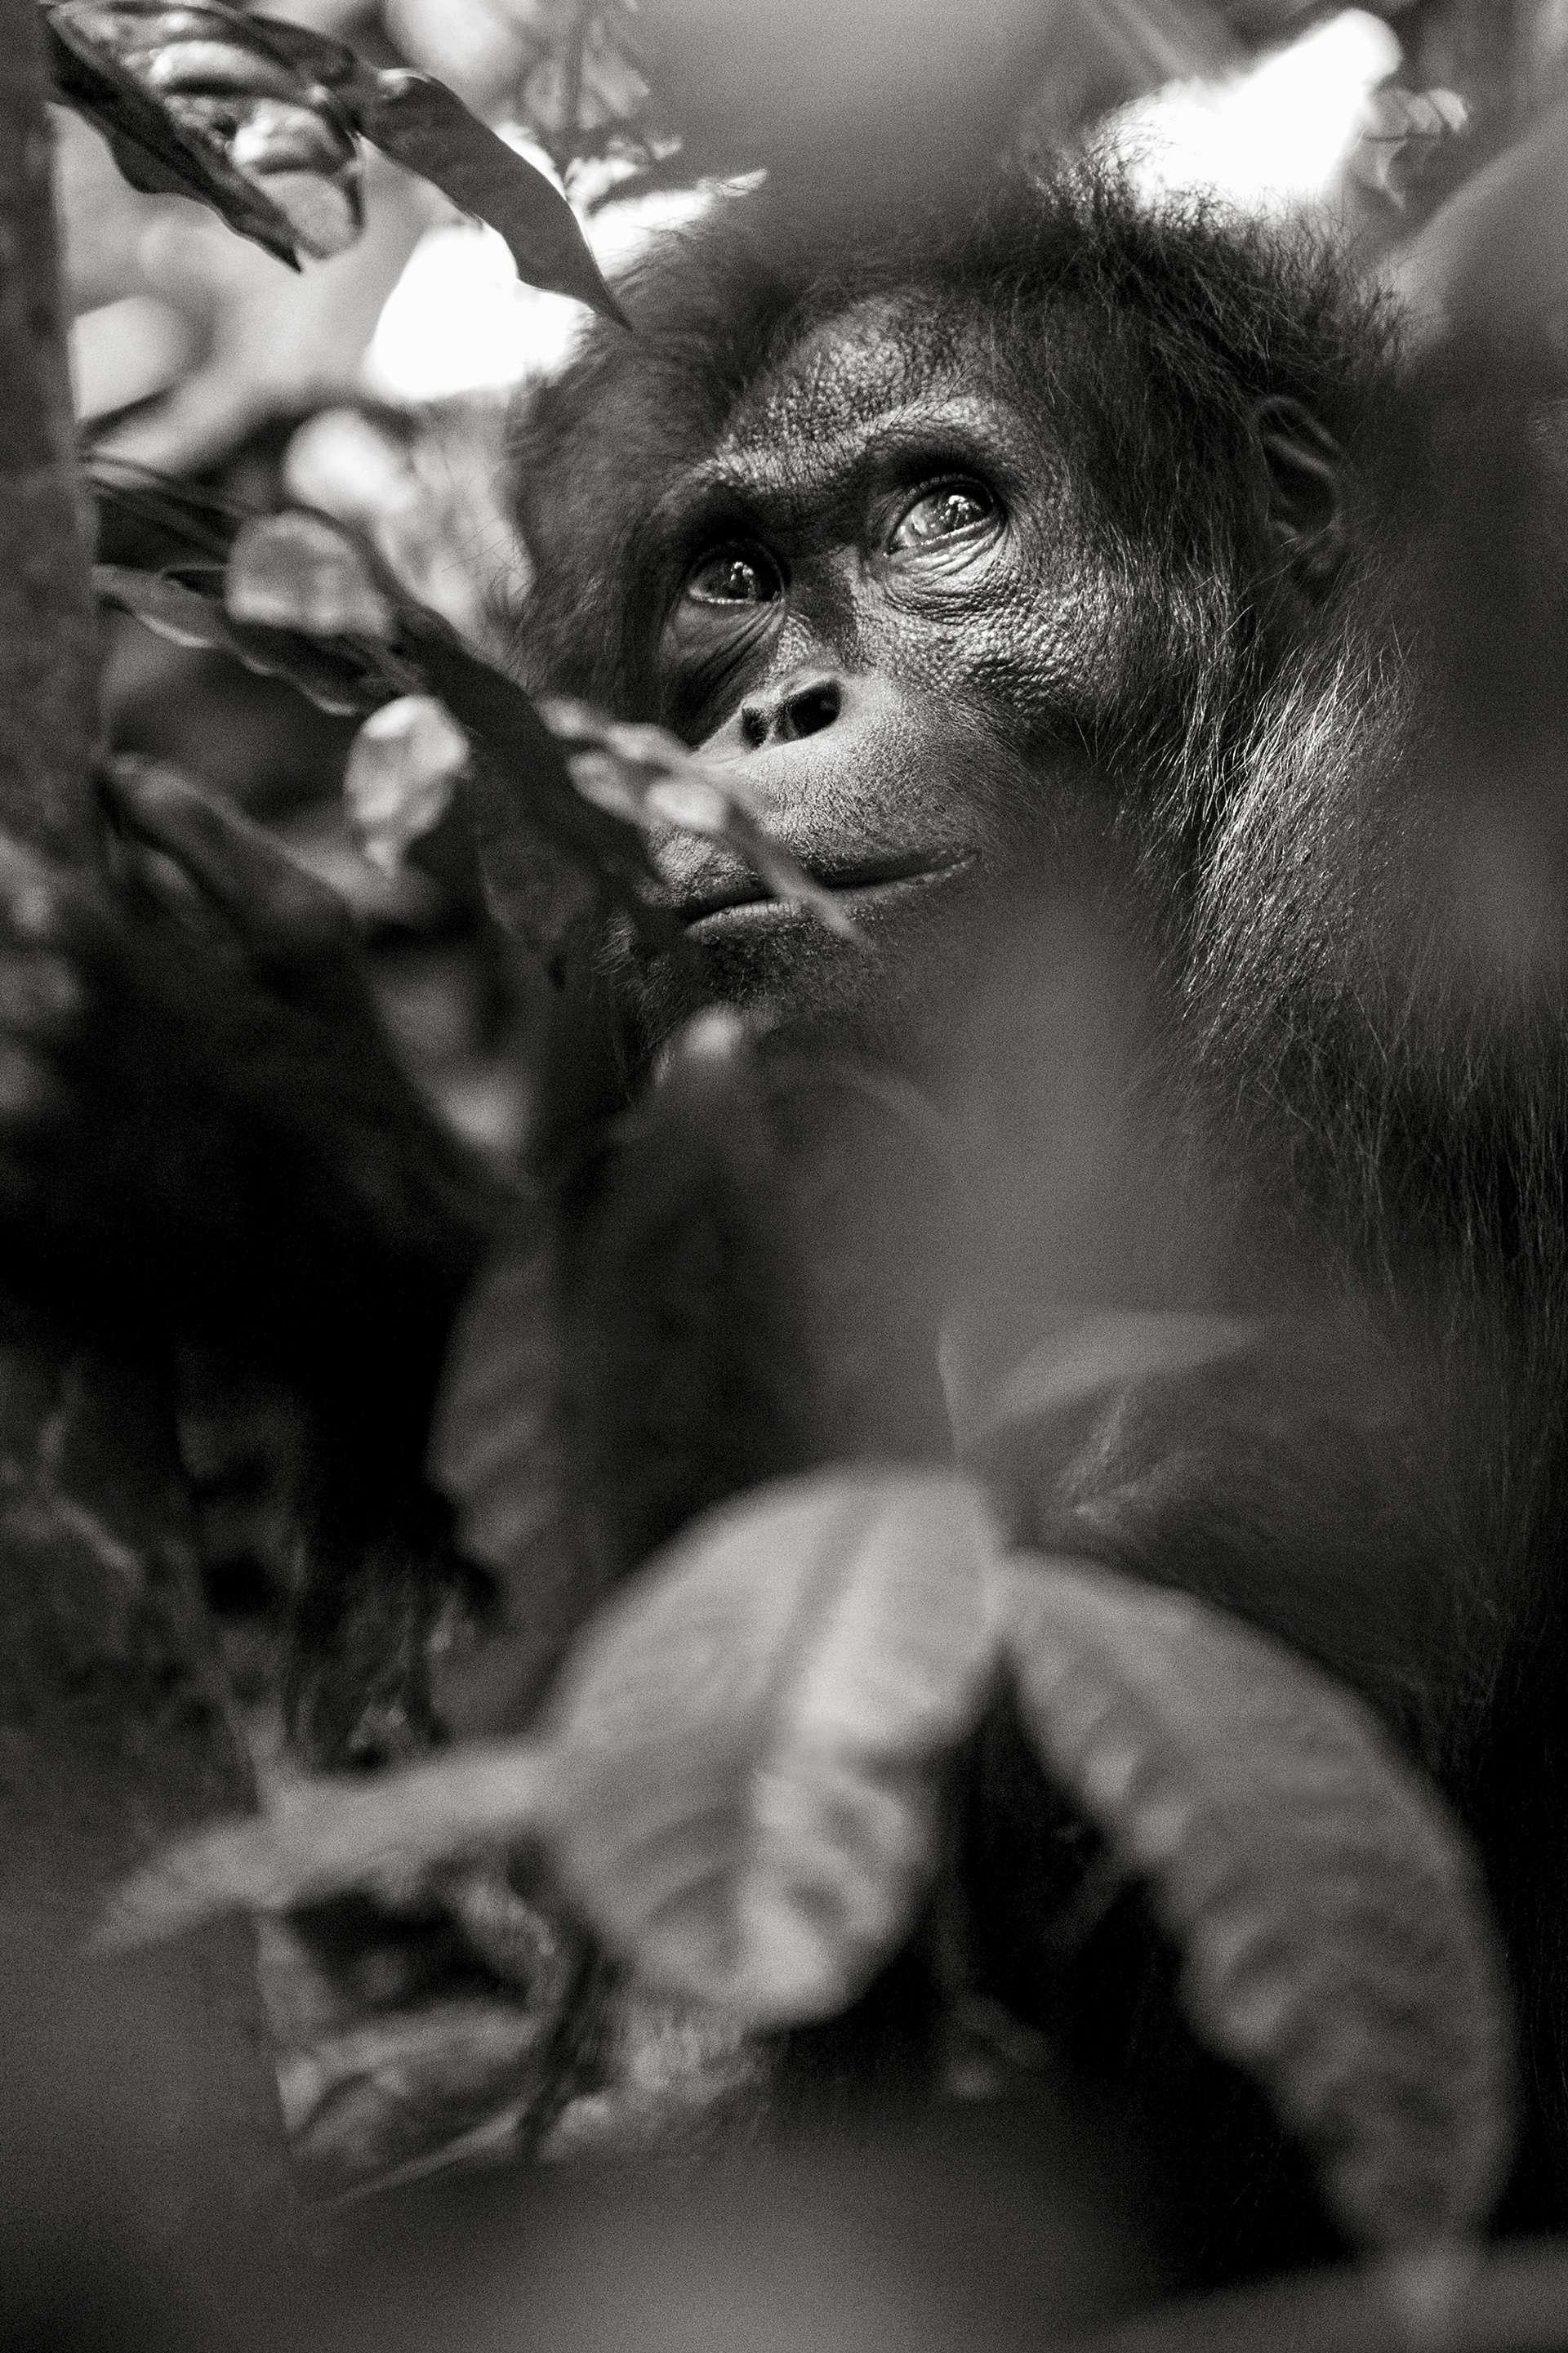 Gilles Martin's photograph : orangutan from Borneo, Struggle for life